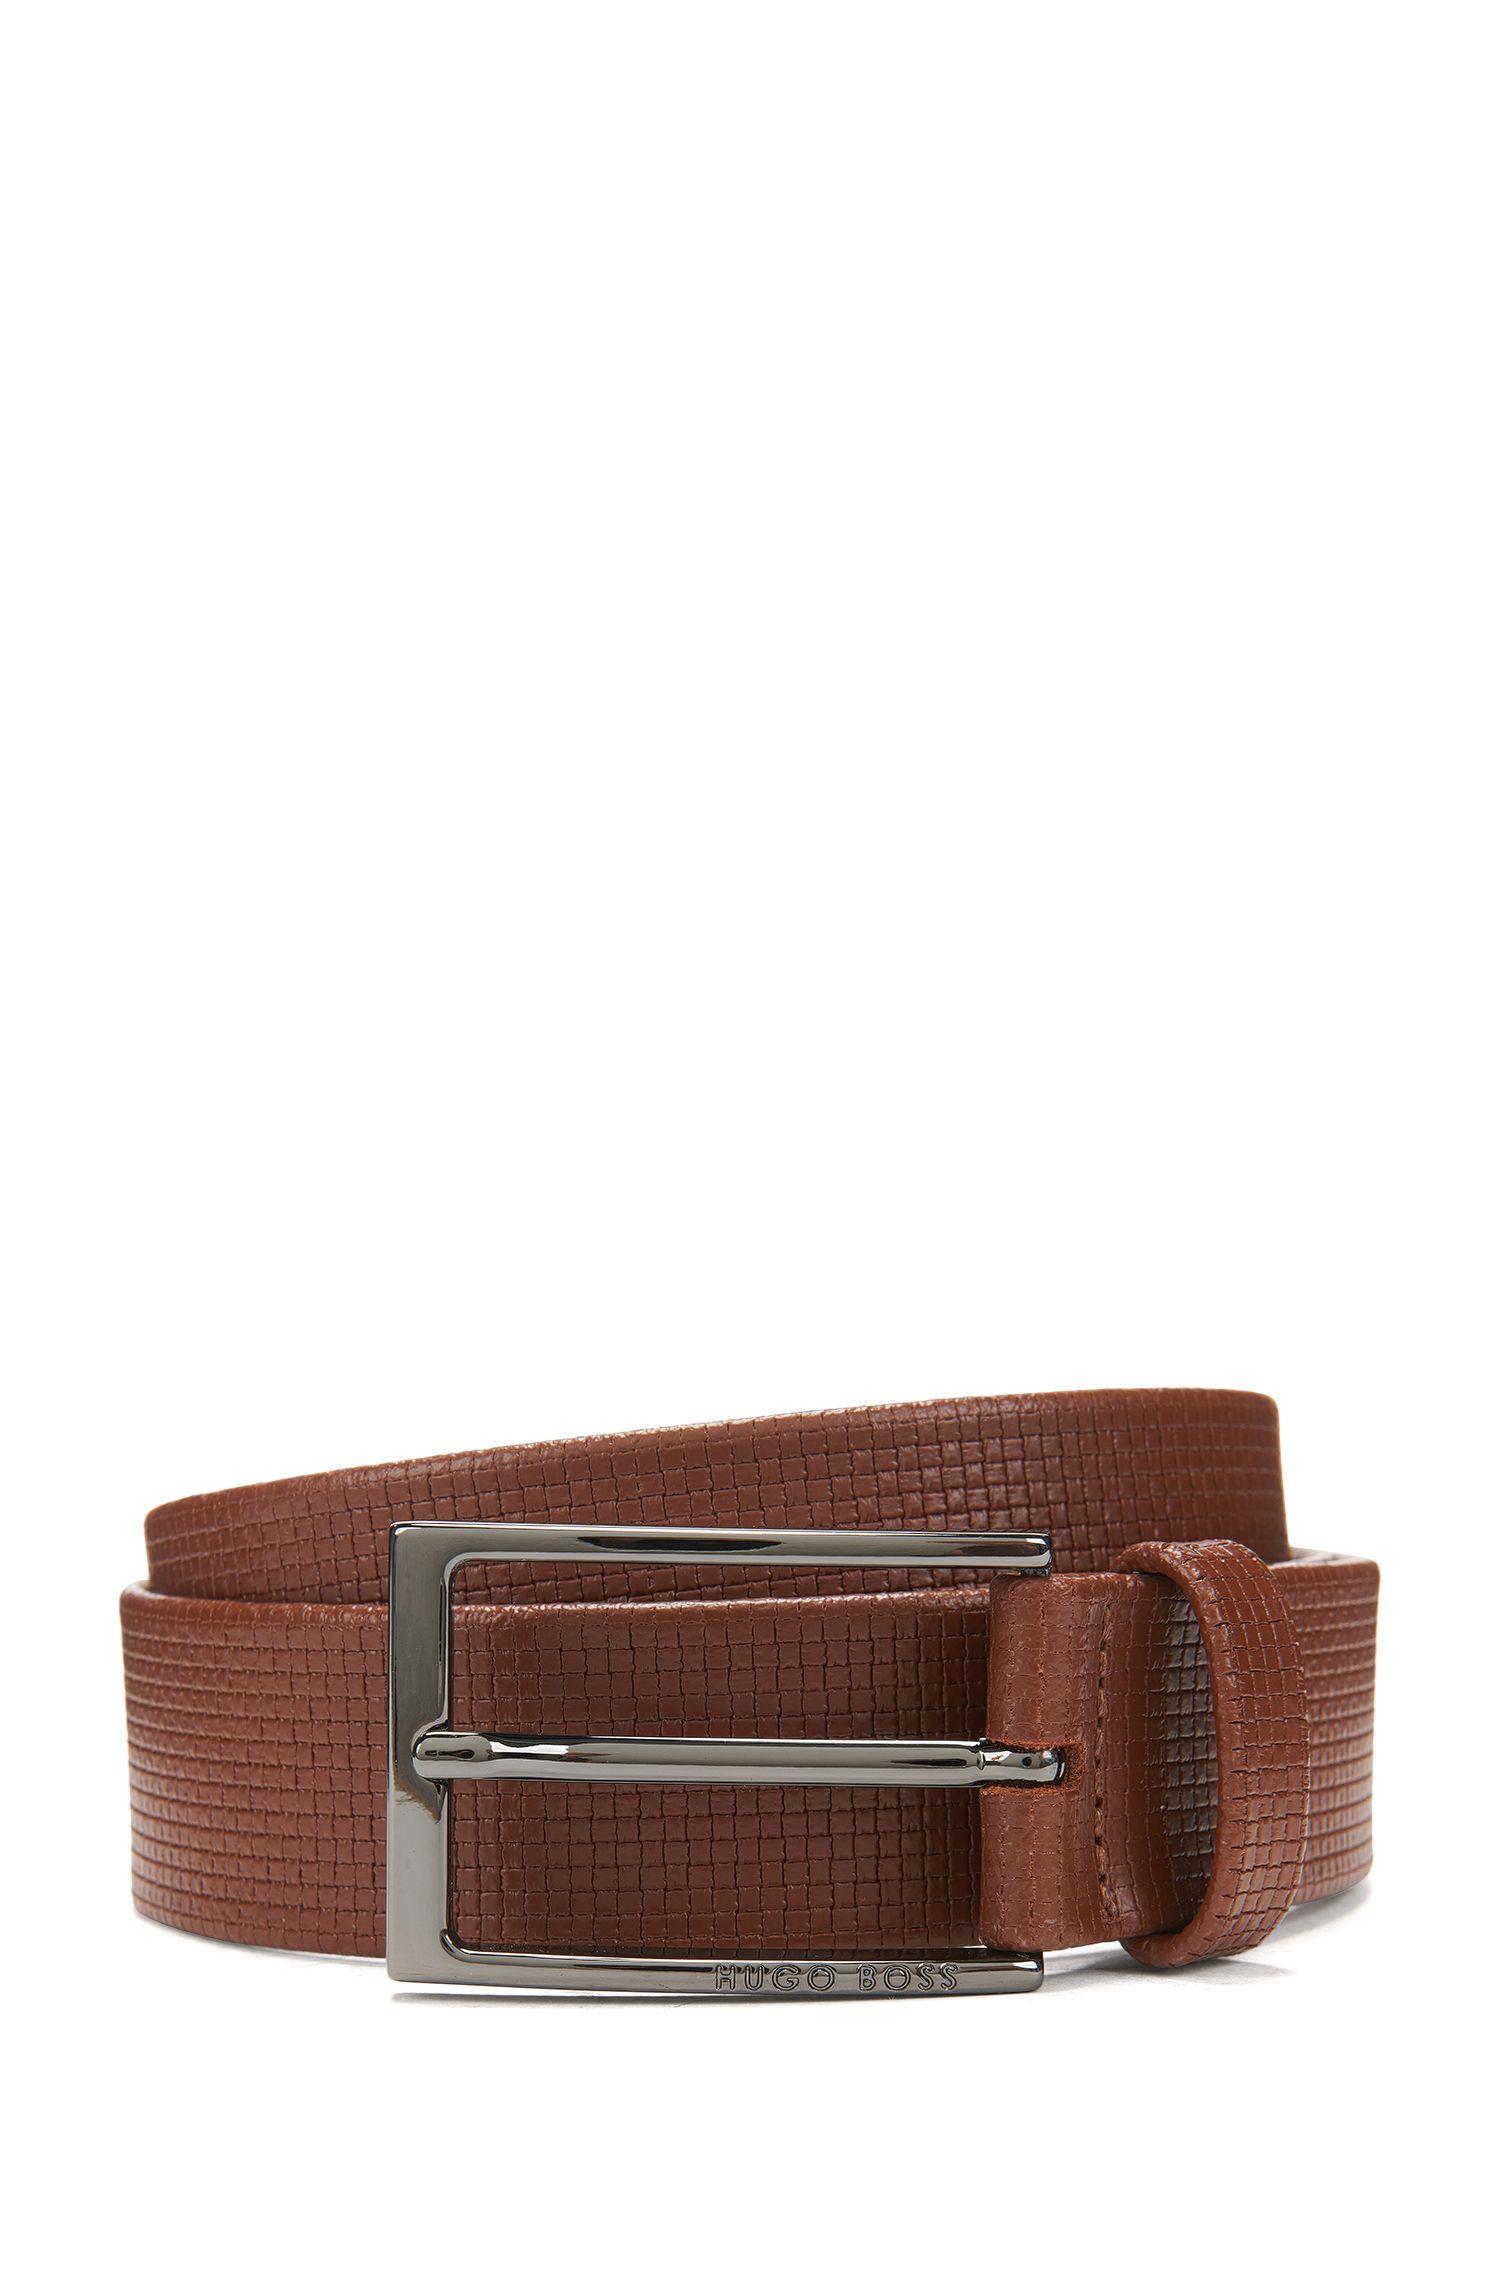 Basketweave-Embossed Leather Belt | Clauxy, Brown